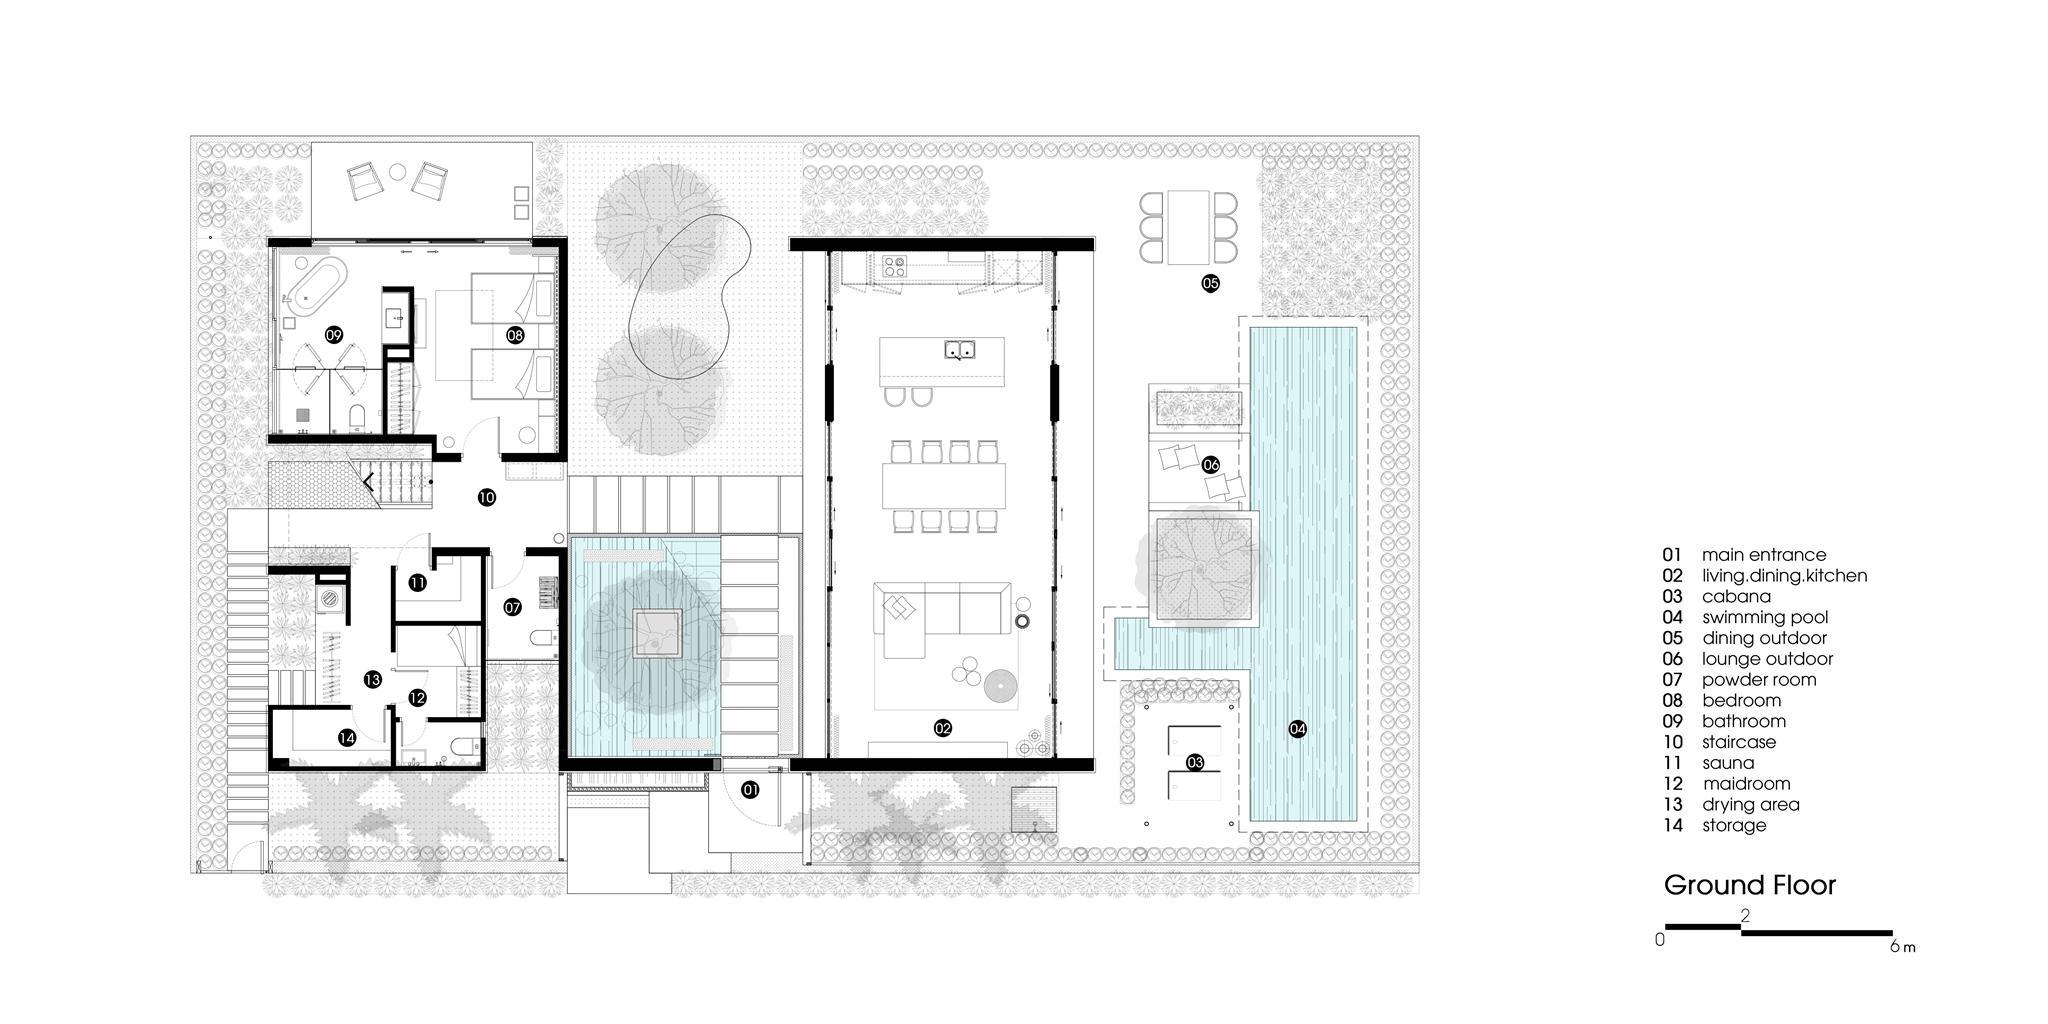 4 Ground Floor (Copy)